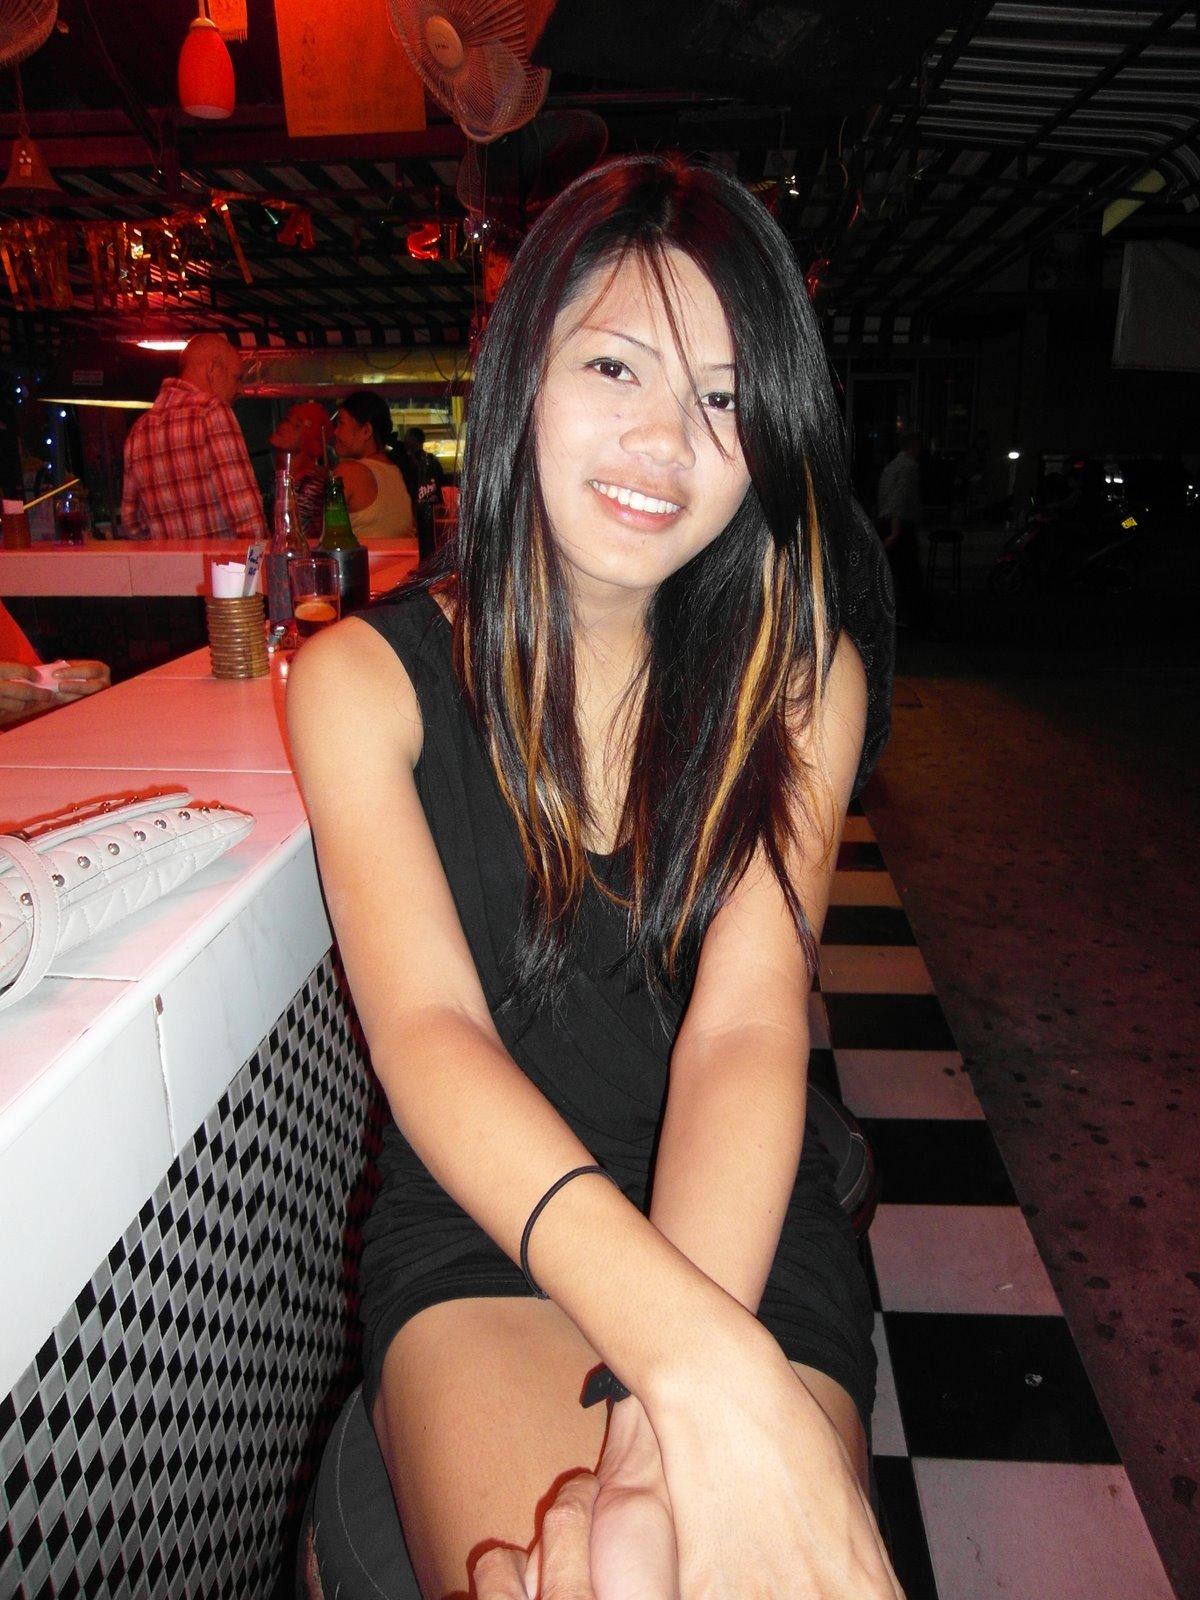 homoseksuell sandnes escort thai escort fuck